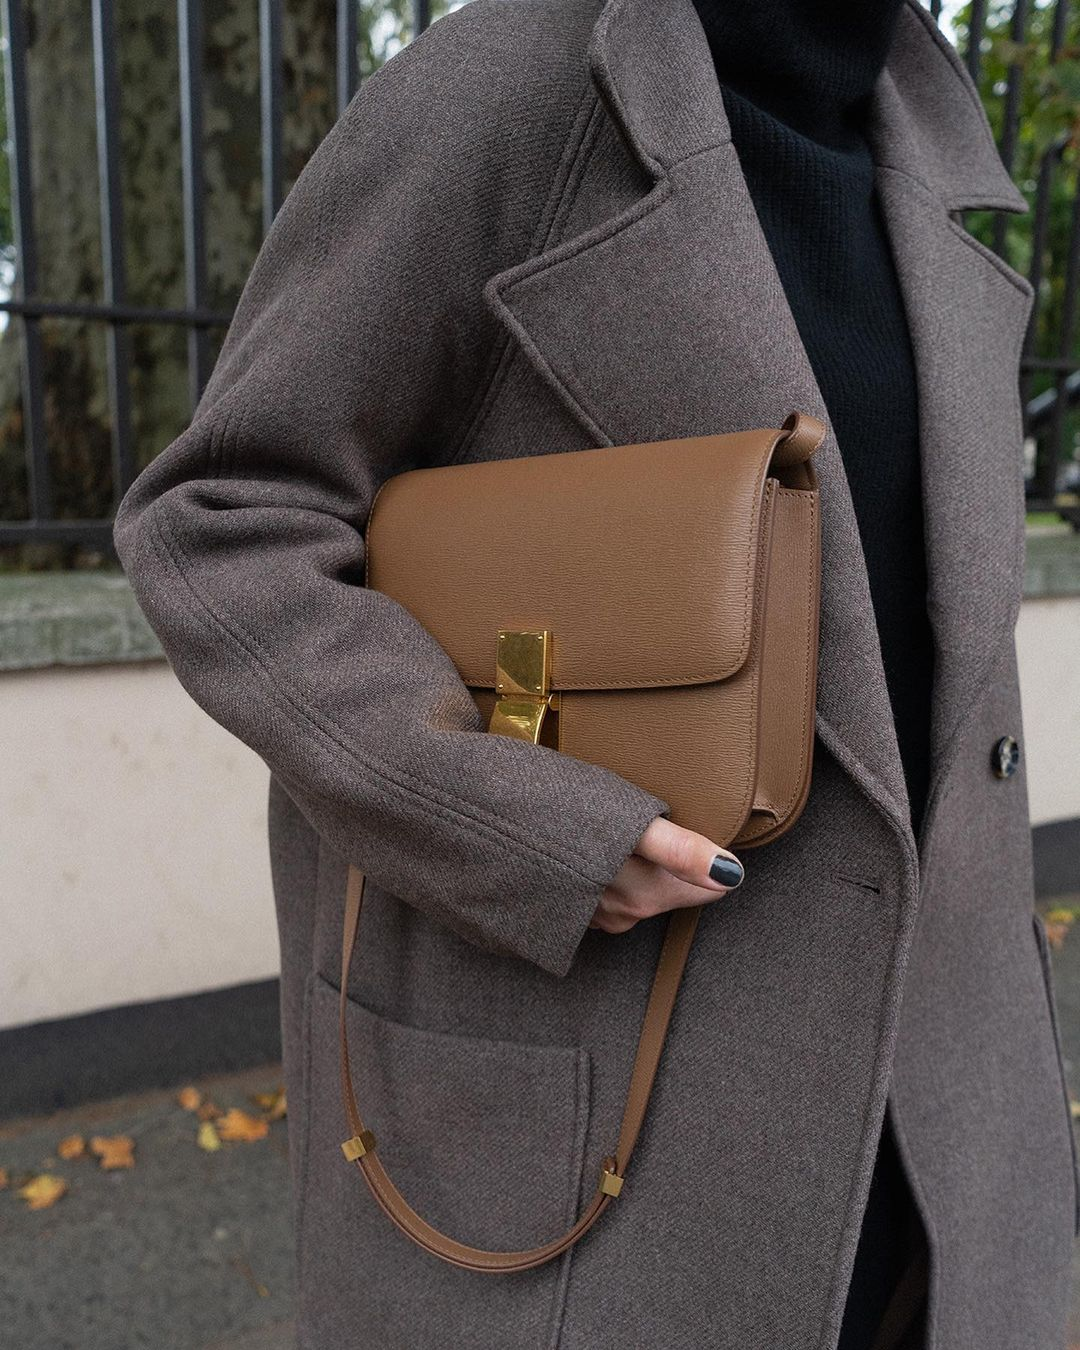 Celine Classic Box Bag styled